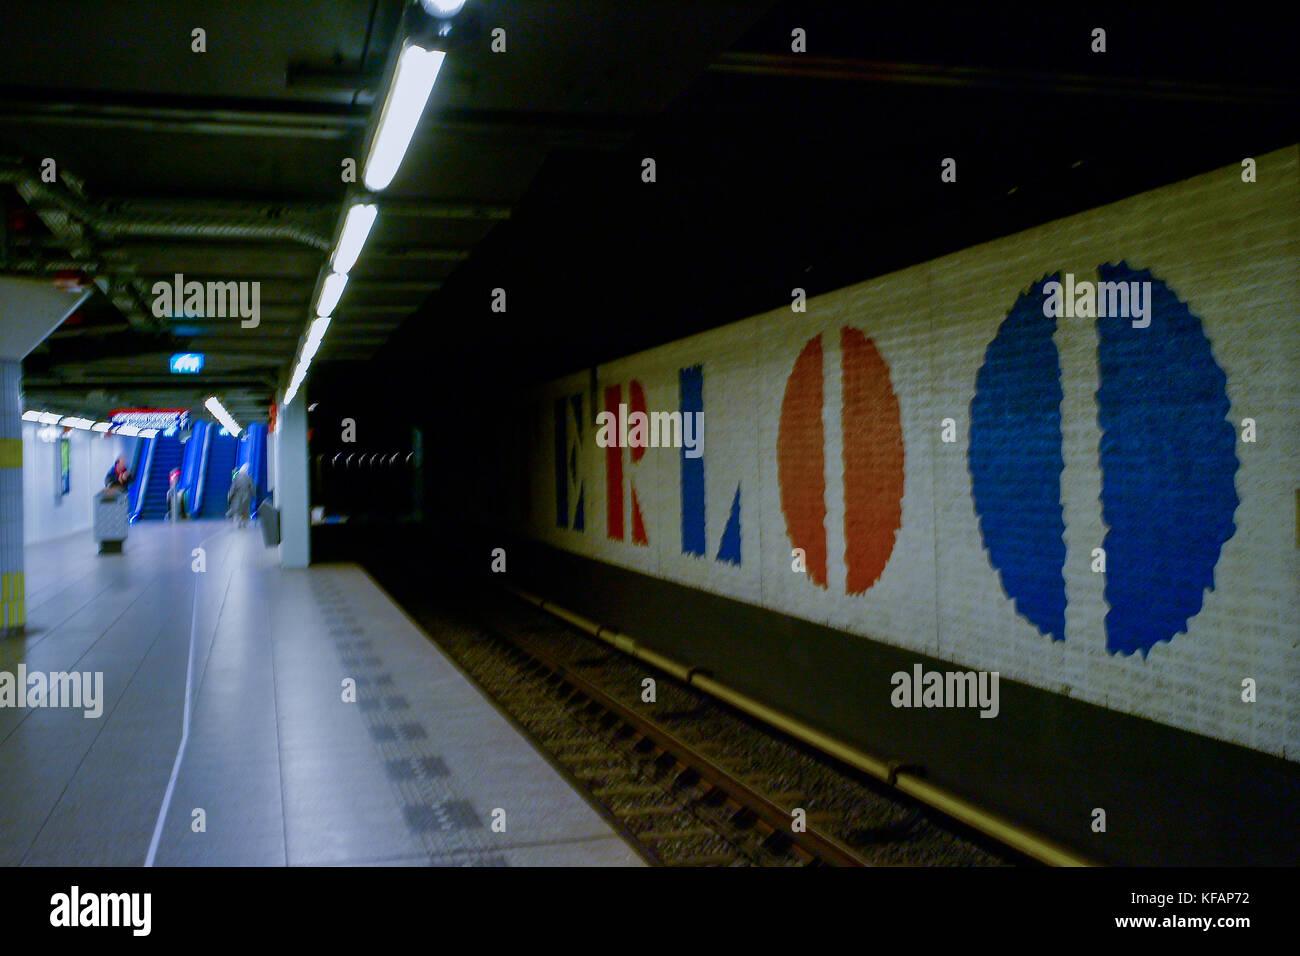 Waterloo metropolitan station, Amsterdam, Netherlands - Stock Image